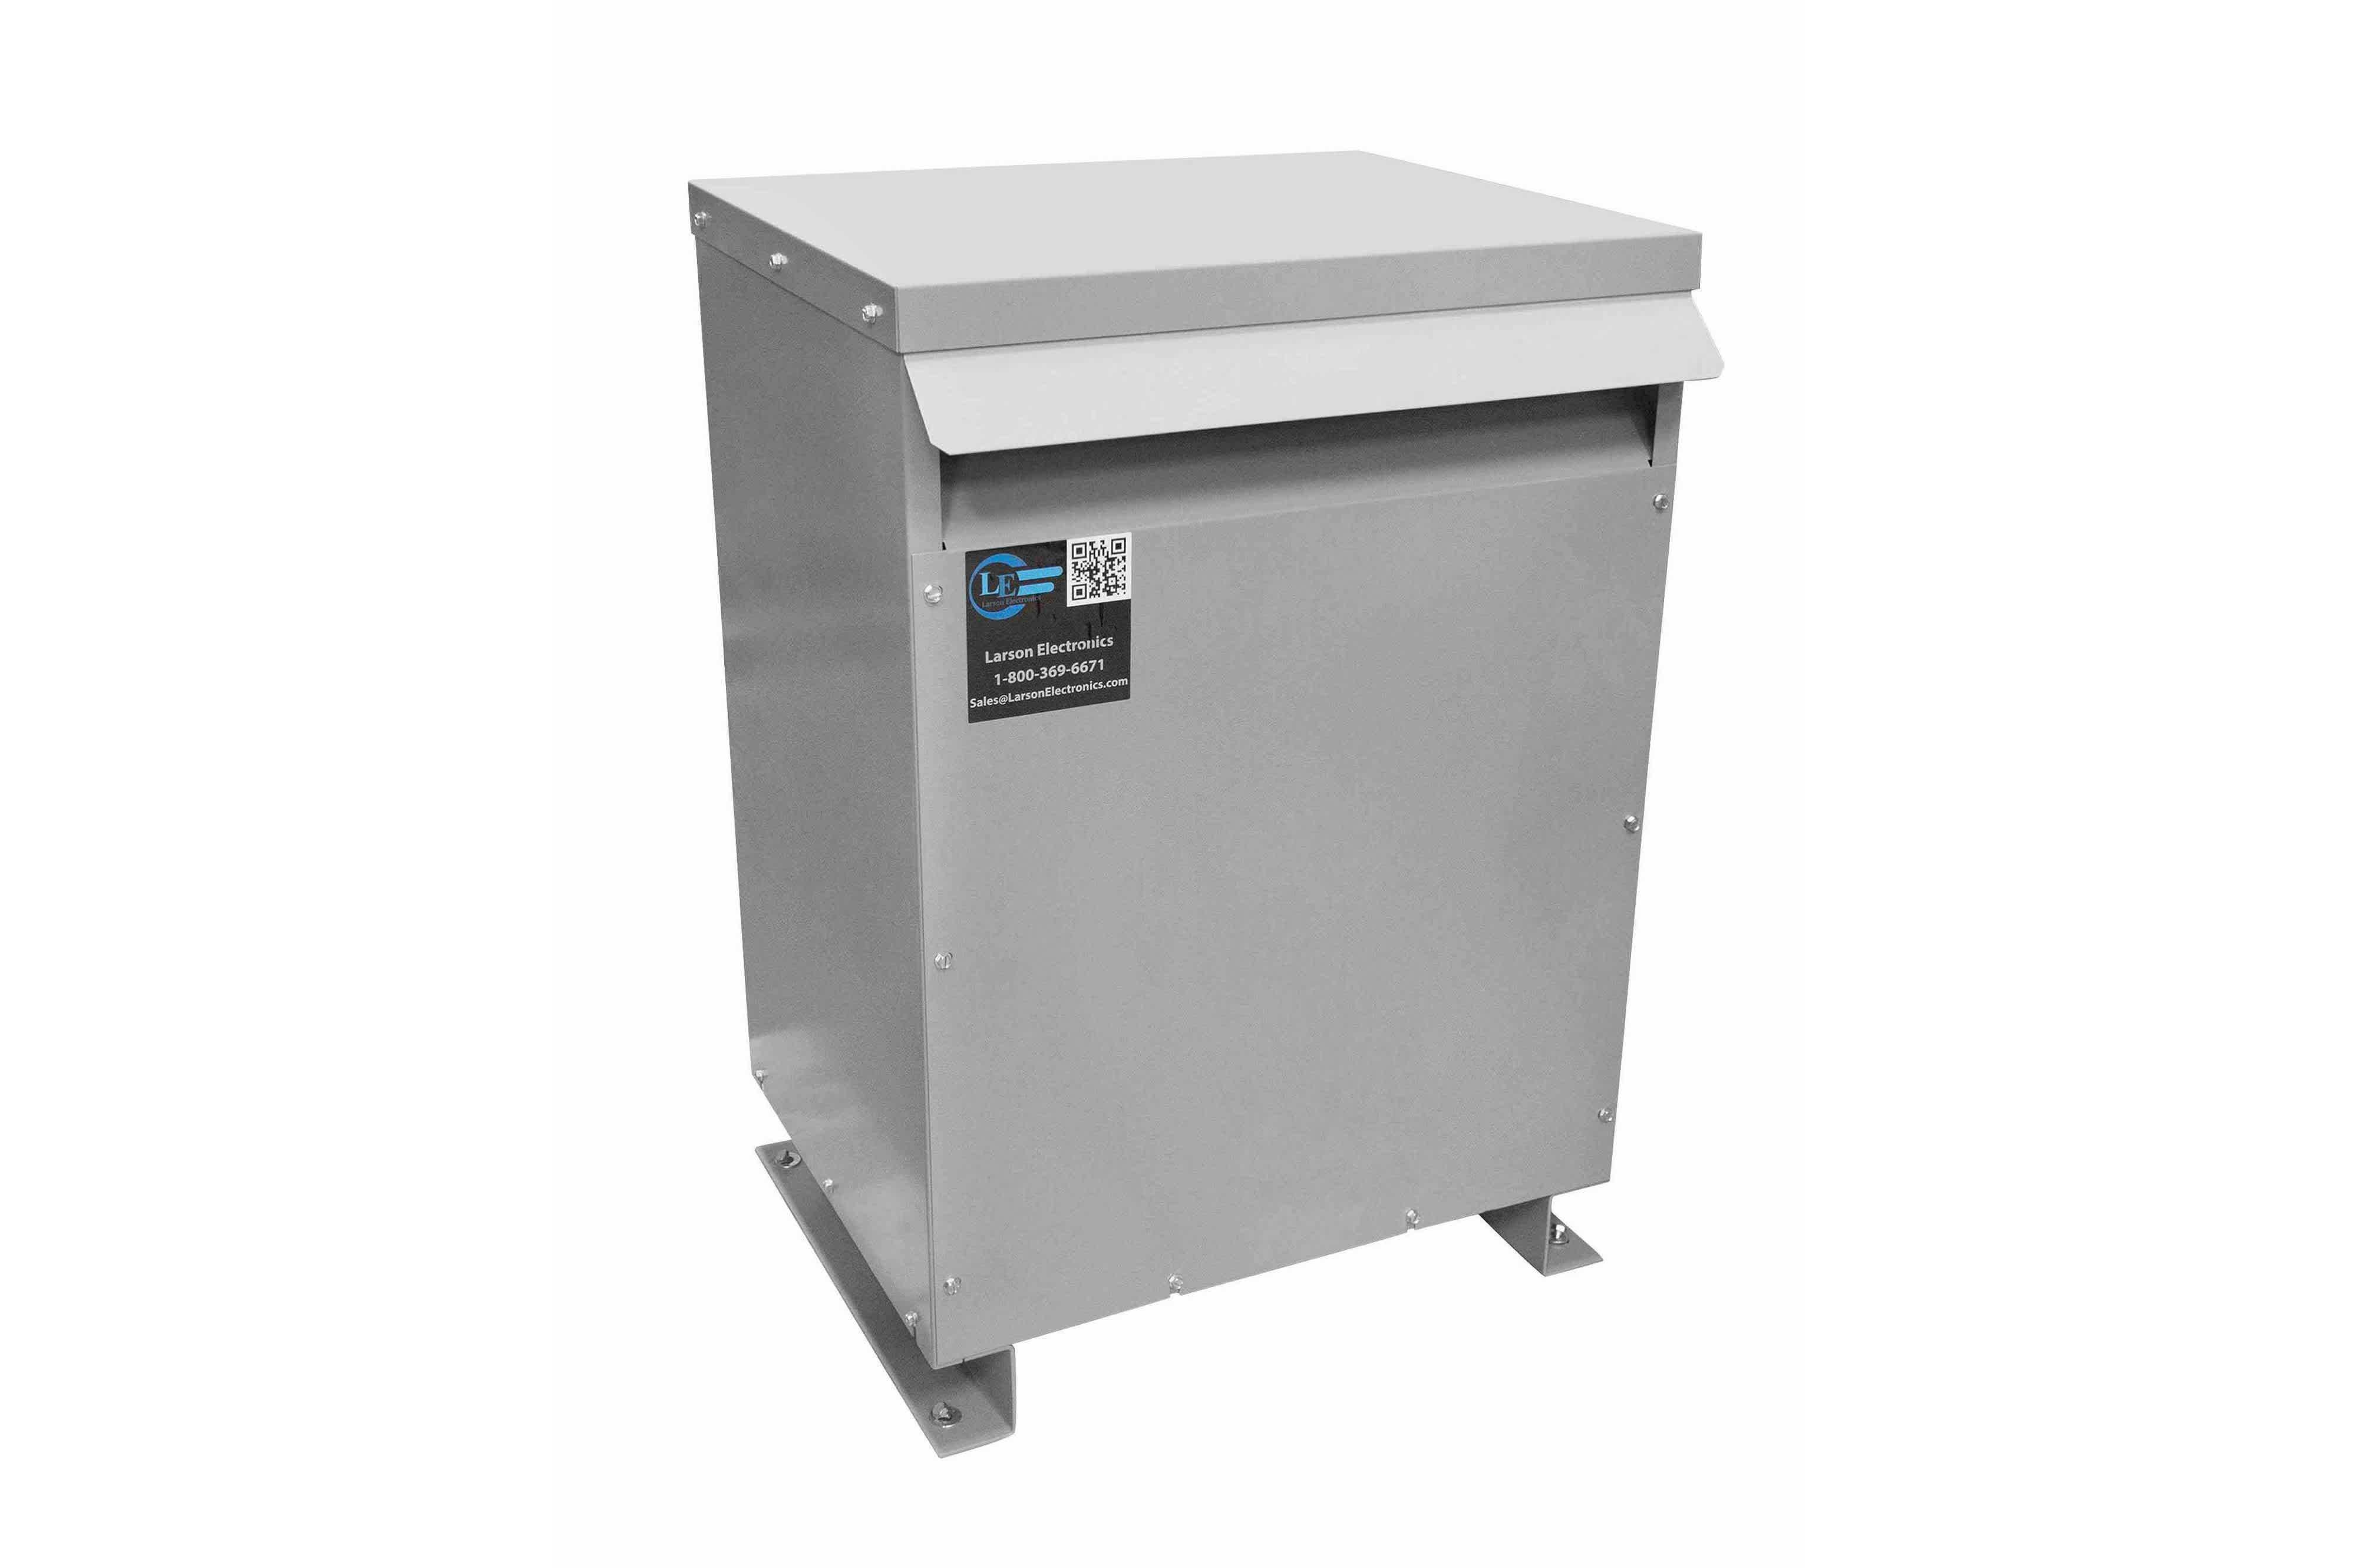 38 kVA 3PH Isolation Transformer, 480V Wye Primary, 400Y/231 Wye-N Secondary, N3R, Ventilated, 60 Hz